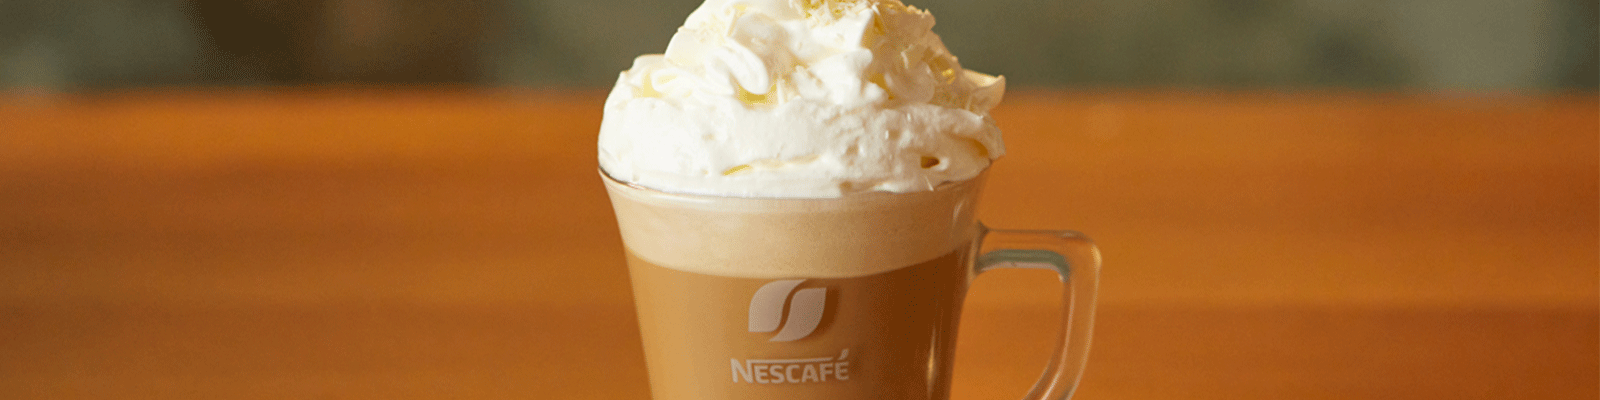 NESCAFE White Chocolate Mocha